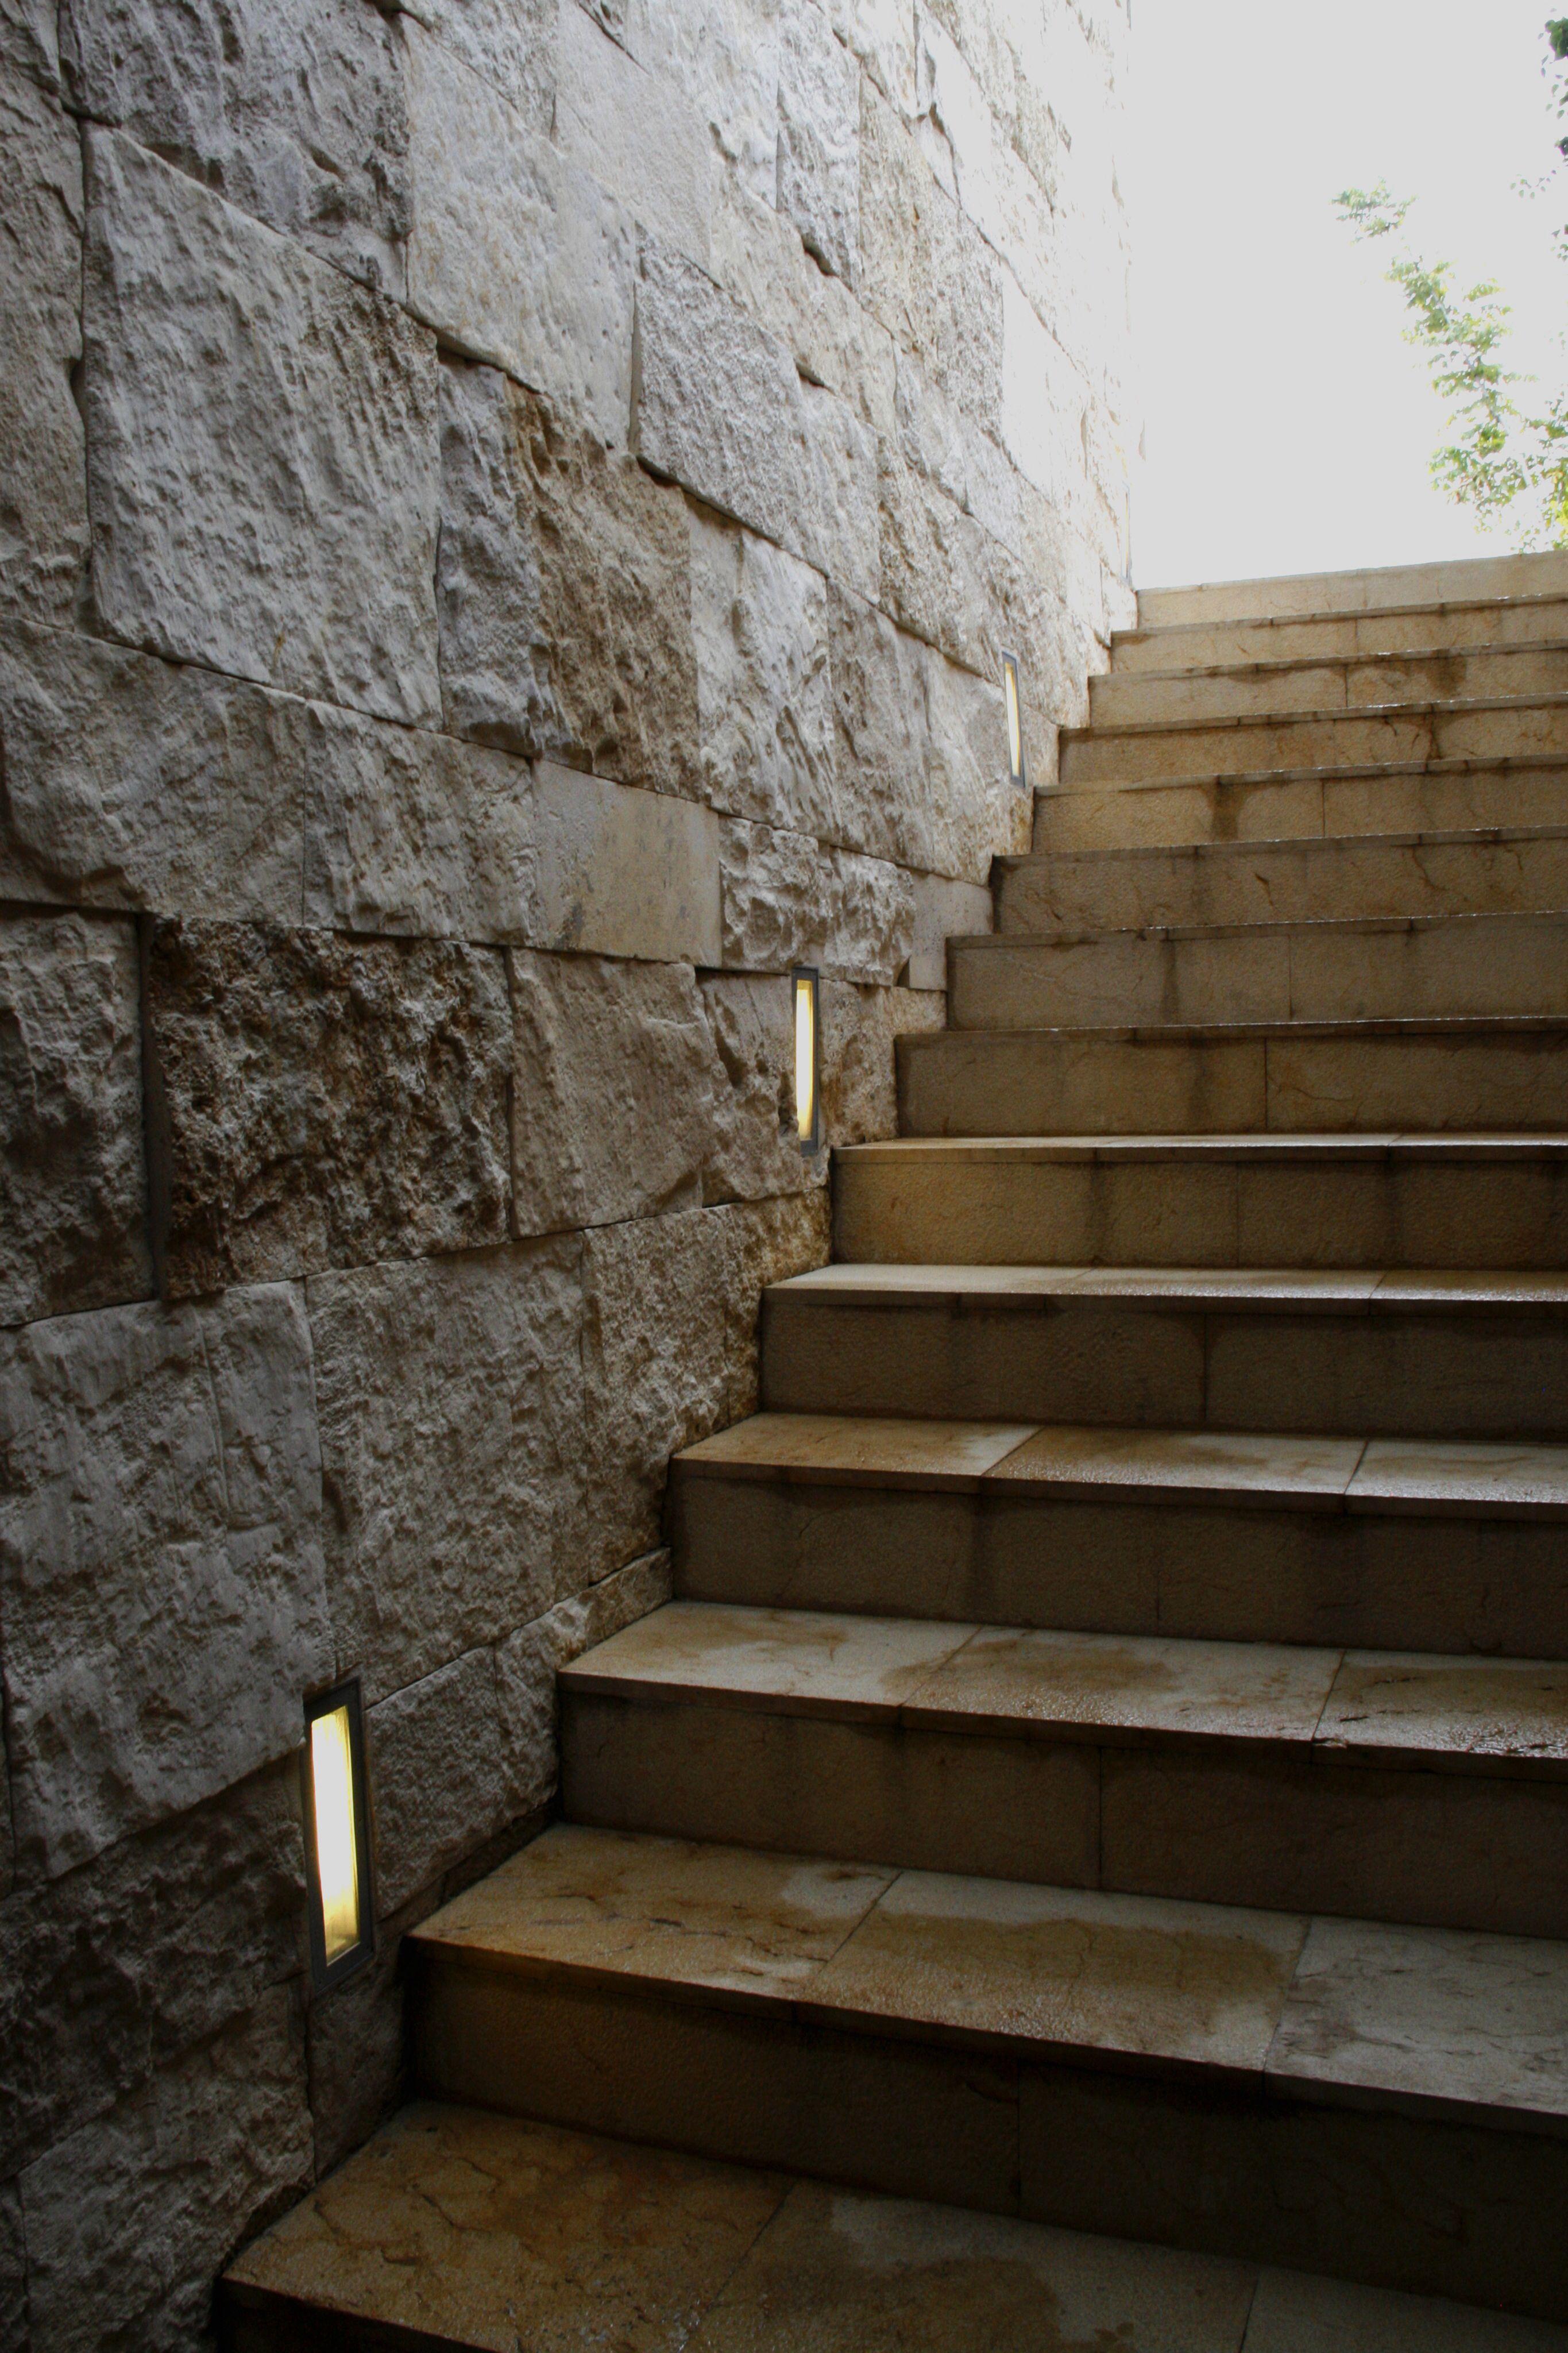 Casa ss escalera de m rmol muro de piedra iluminaci n c digo z arquitectos casa ss - Iluminacion de escaleras ...